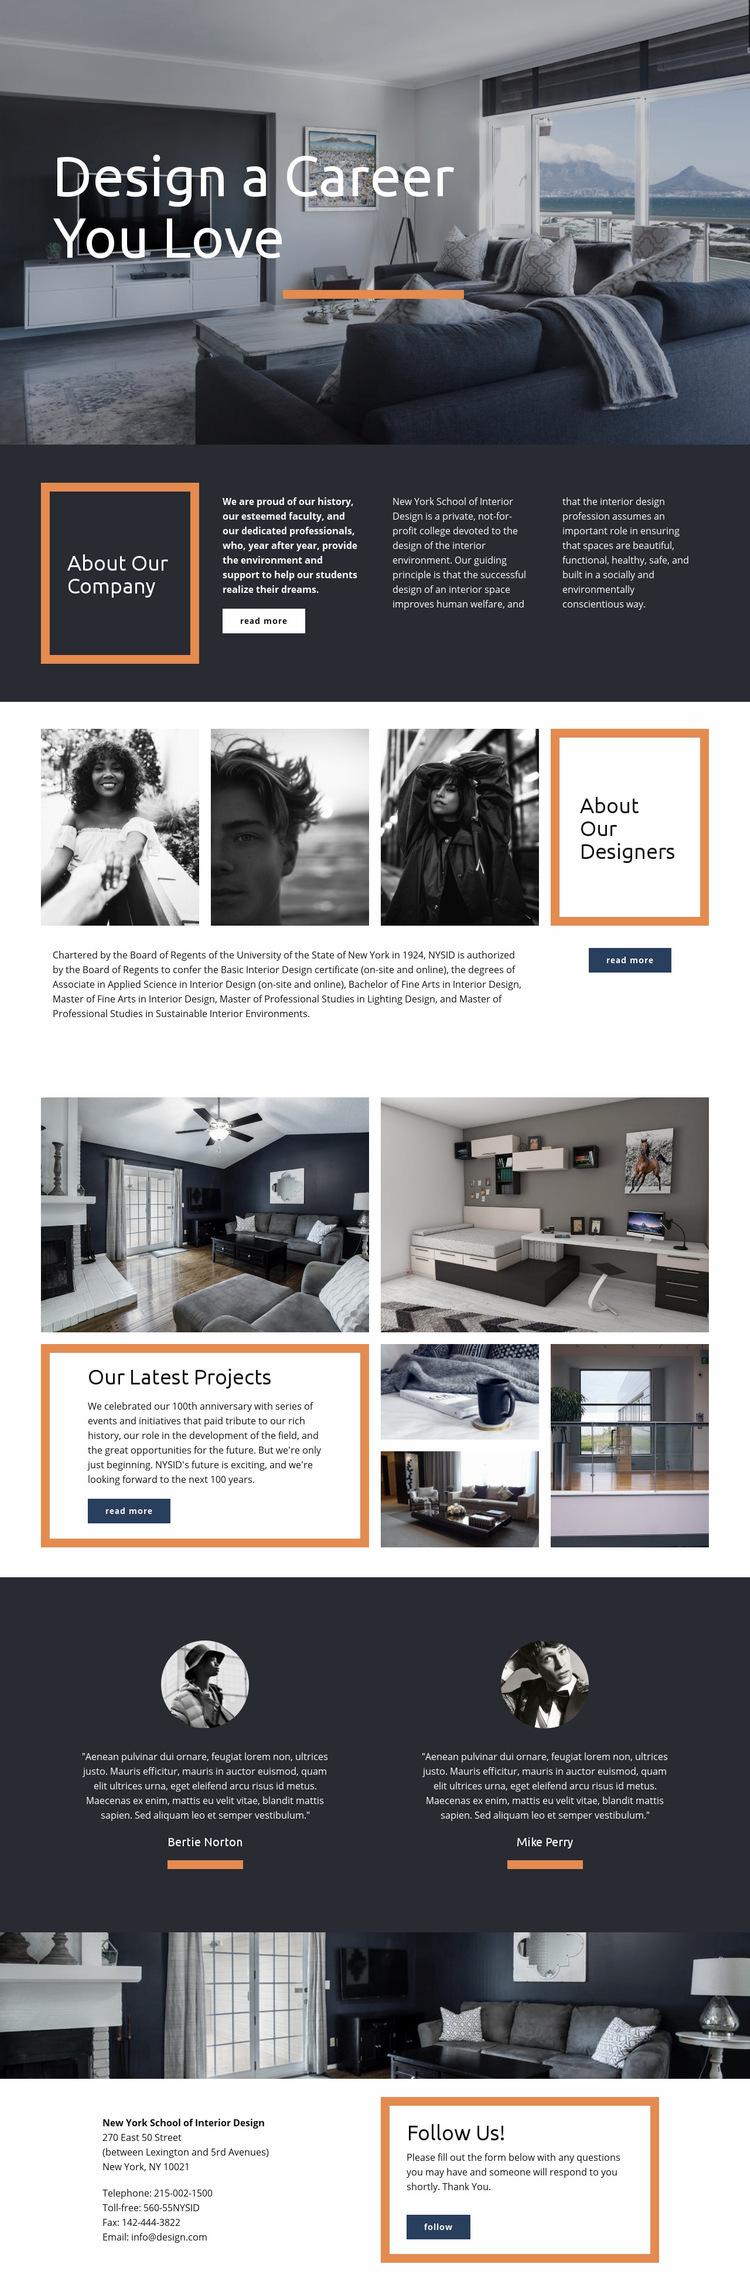 Design a Career You Love Web Page Design